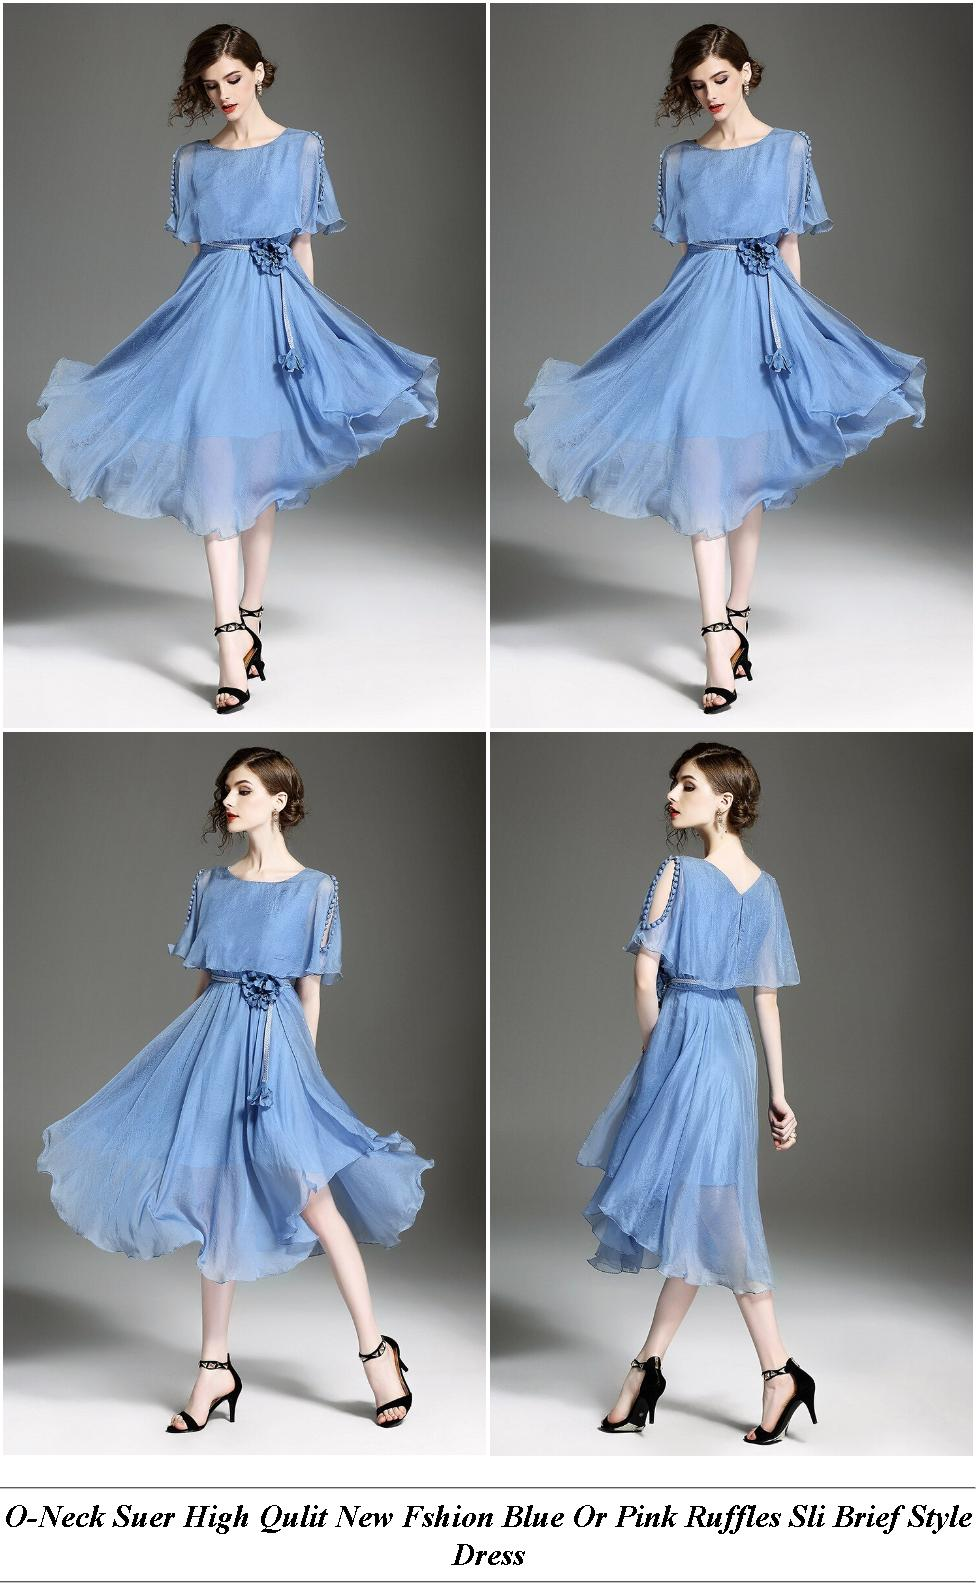 Beach Cover Up Dresses - Warehouse Clearance Sale - Denim Dress - Cheap Clothes Online Uk